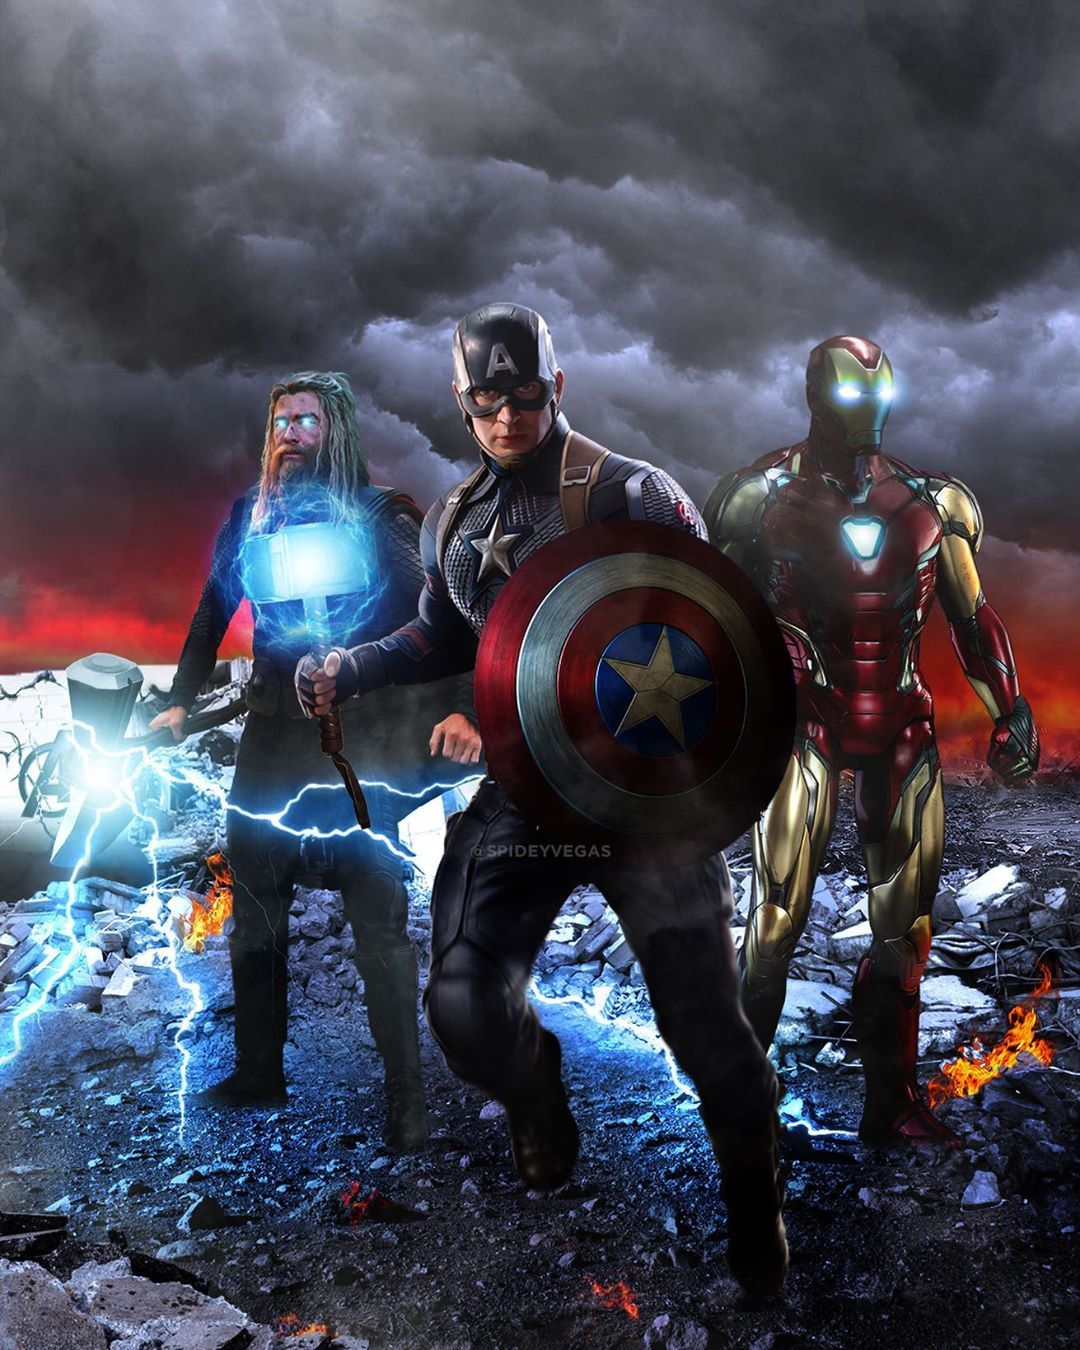 The Big Iii Follow Spideyvegas For More Avengersendgame